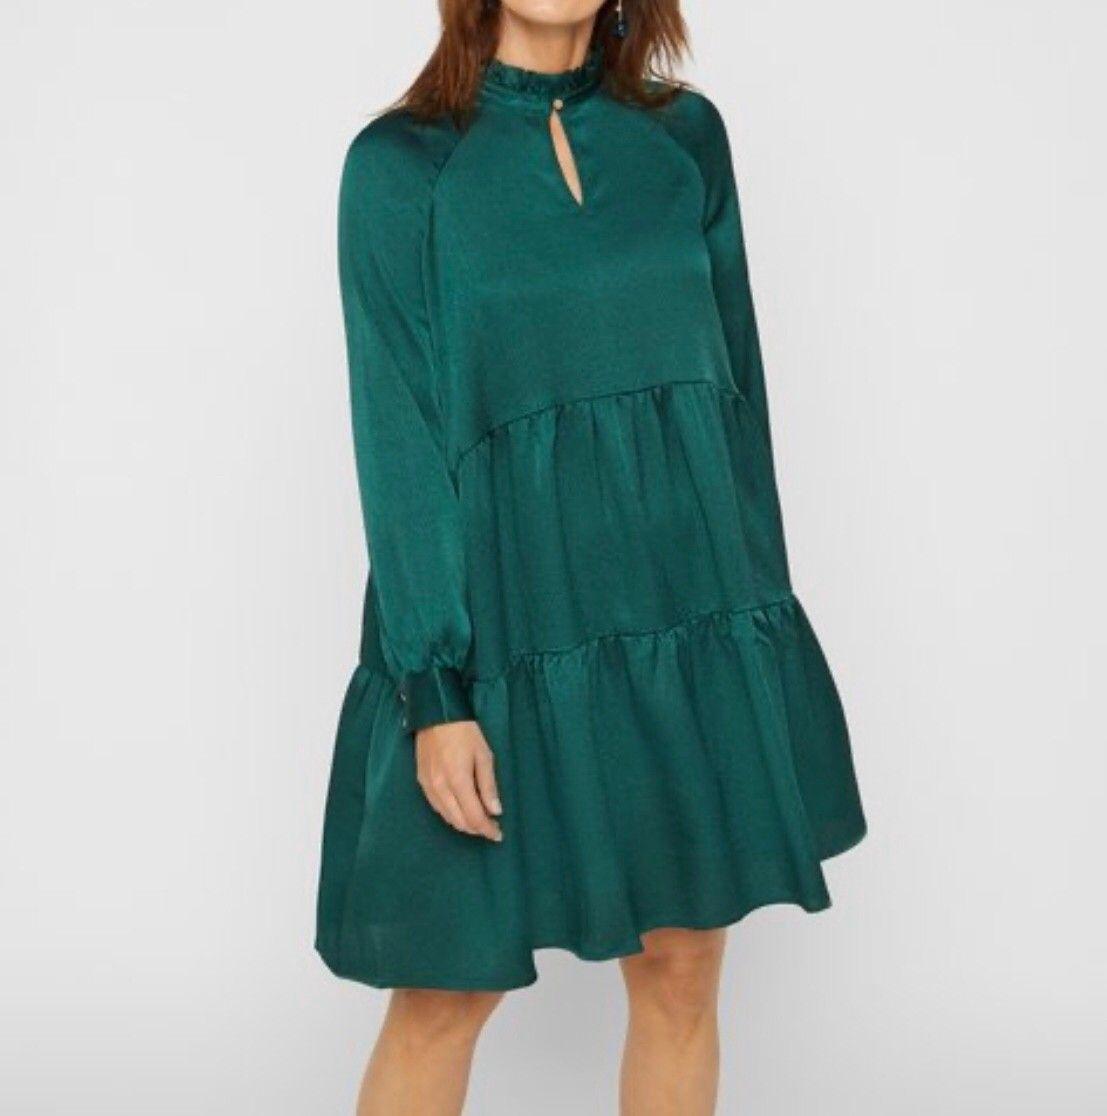 Sofie Scnoor kjole | FINN.no